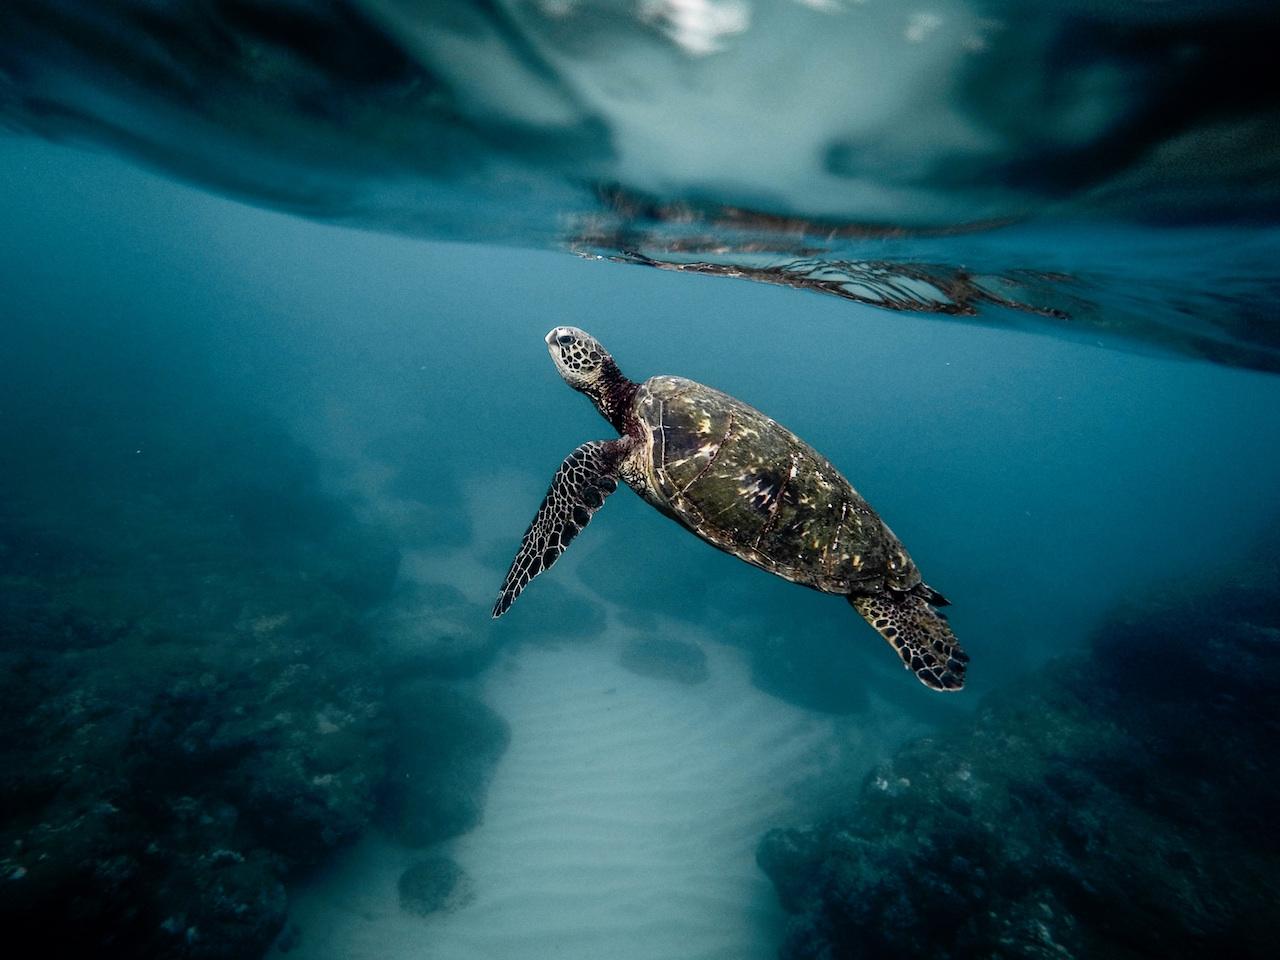 Stoked on snorkeling